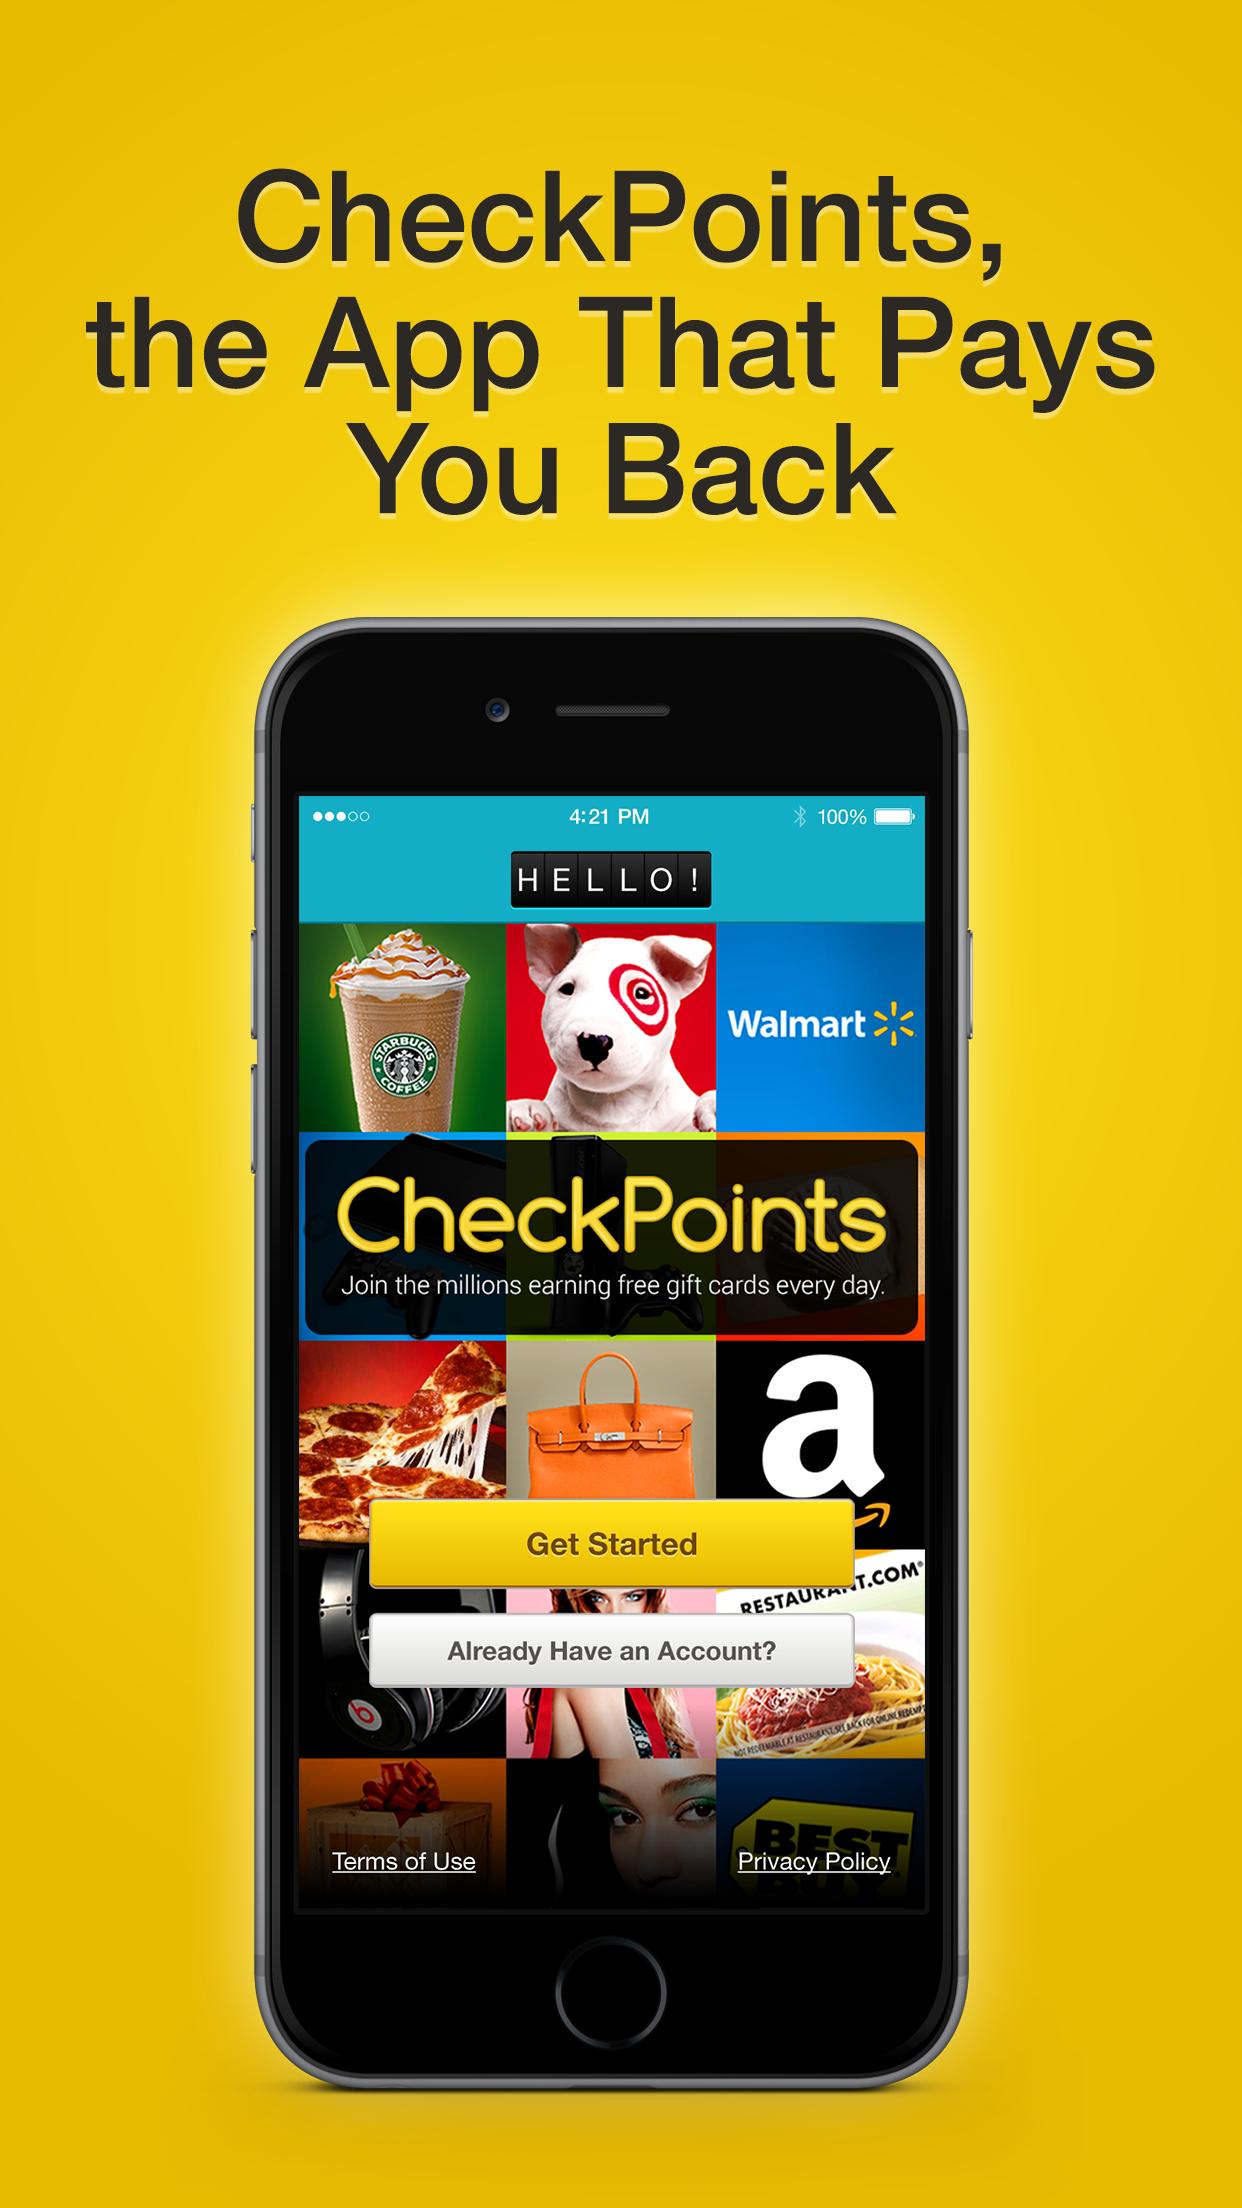 CheckPoints #1 Rewards App Screenshot